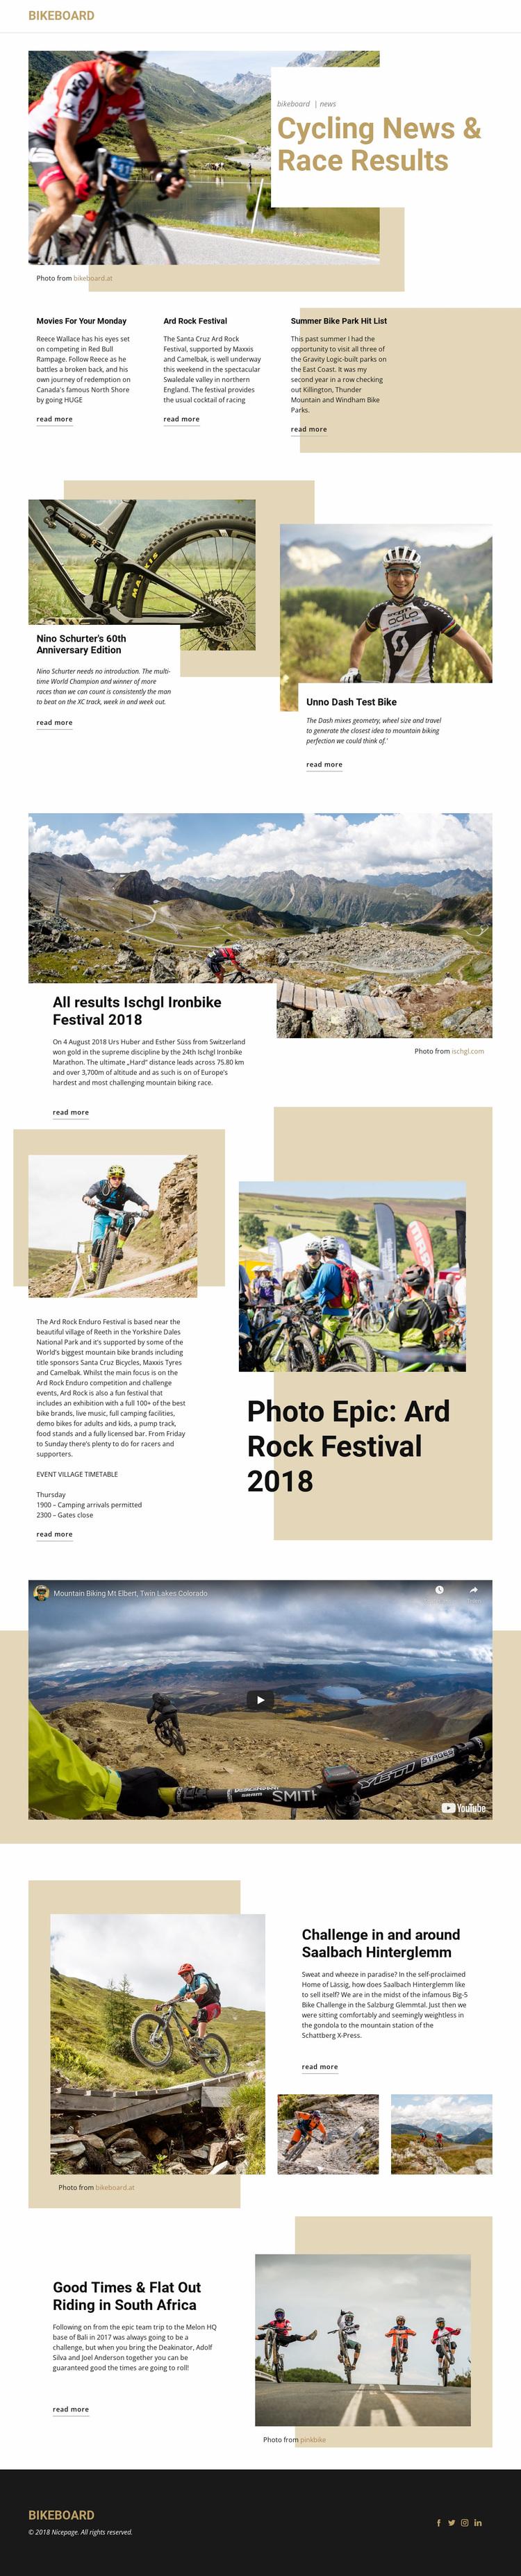 Cycling News Website Design